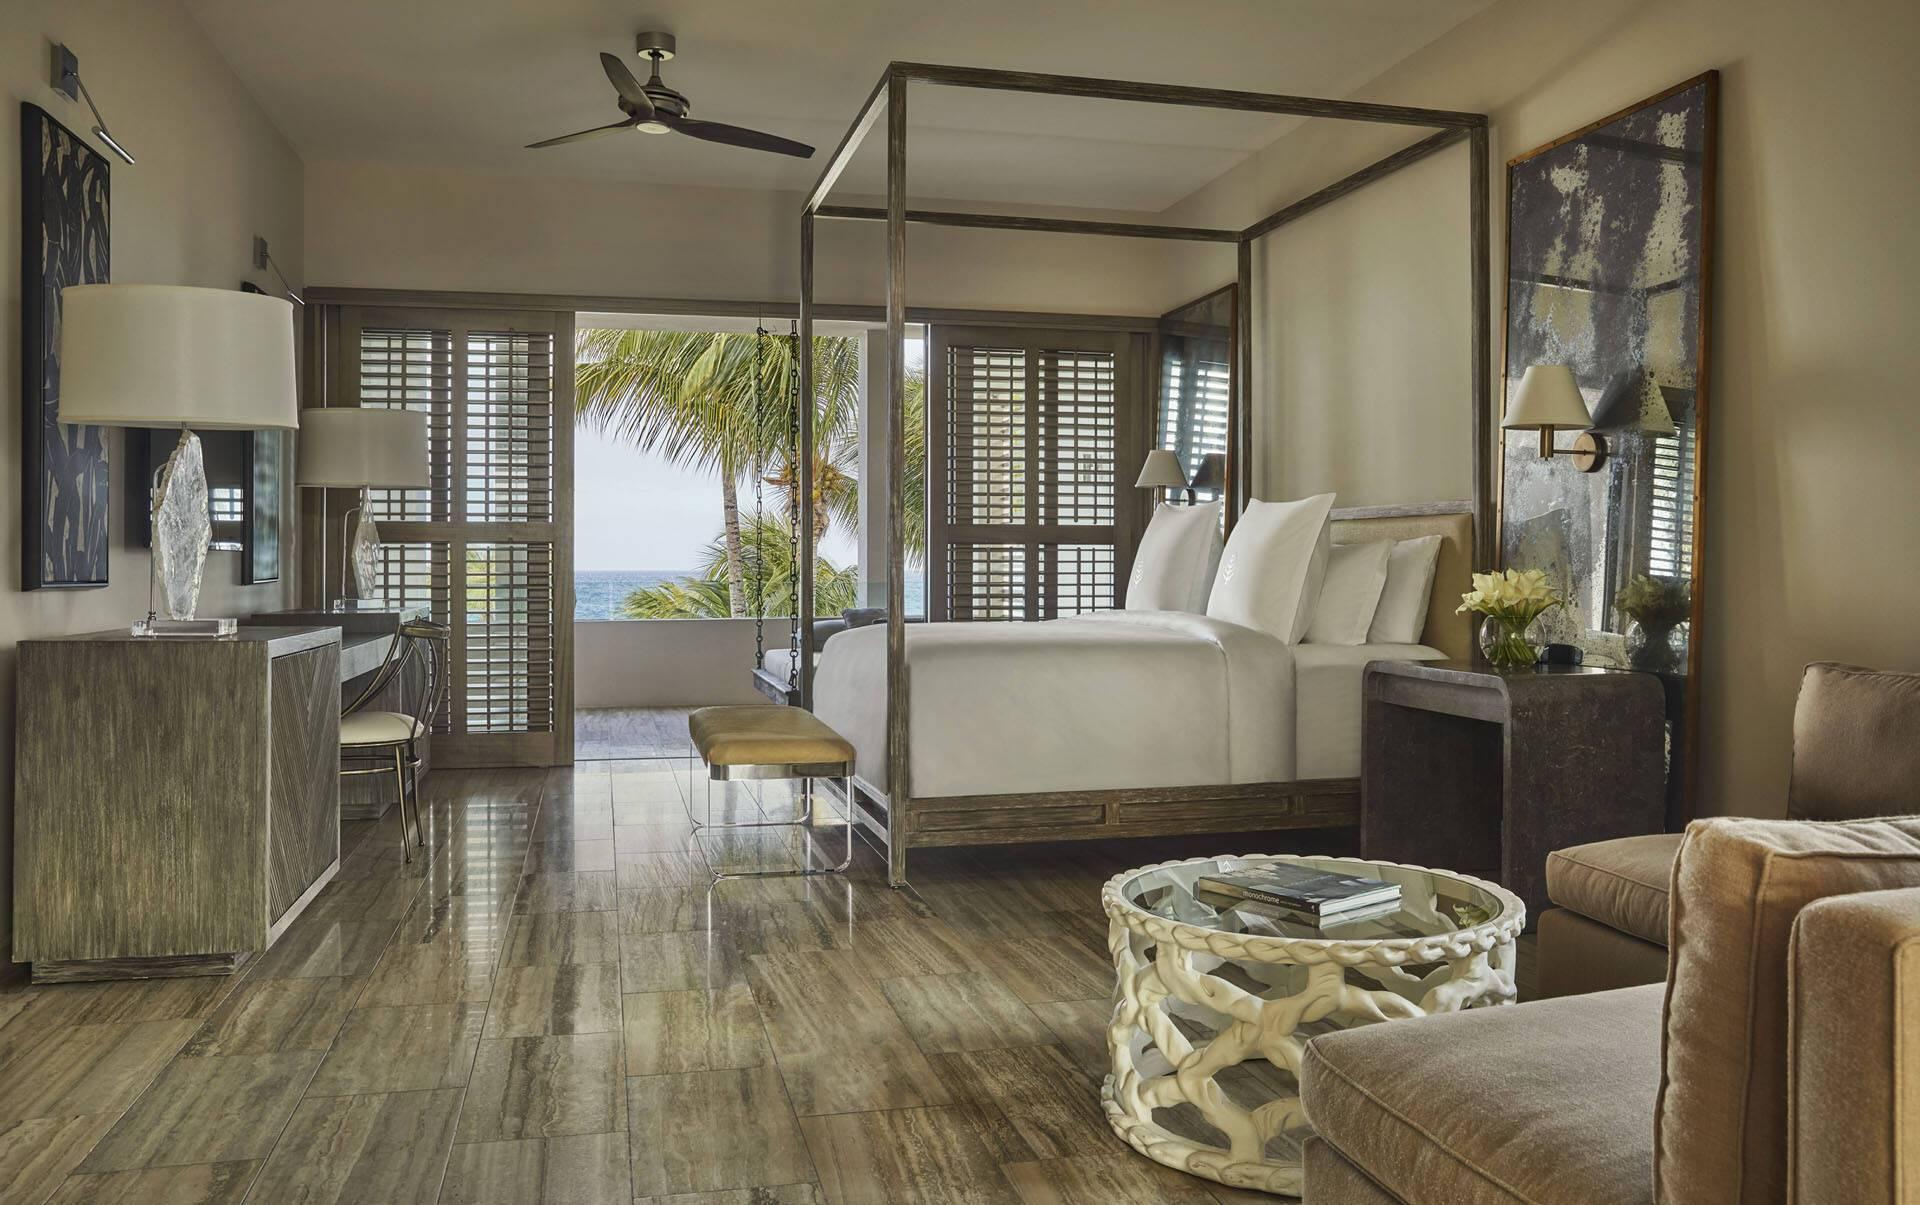 Four Seasons Anguilla Three Bedroom Beachfront Villa AnguillaJPG